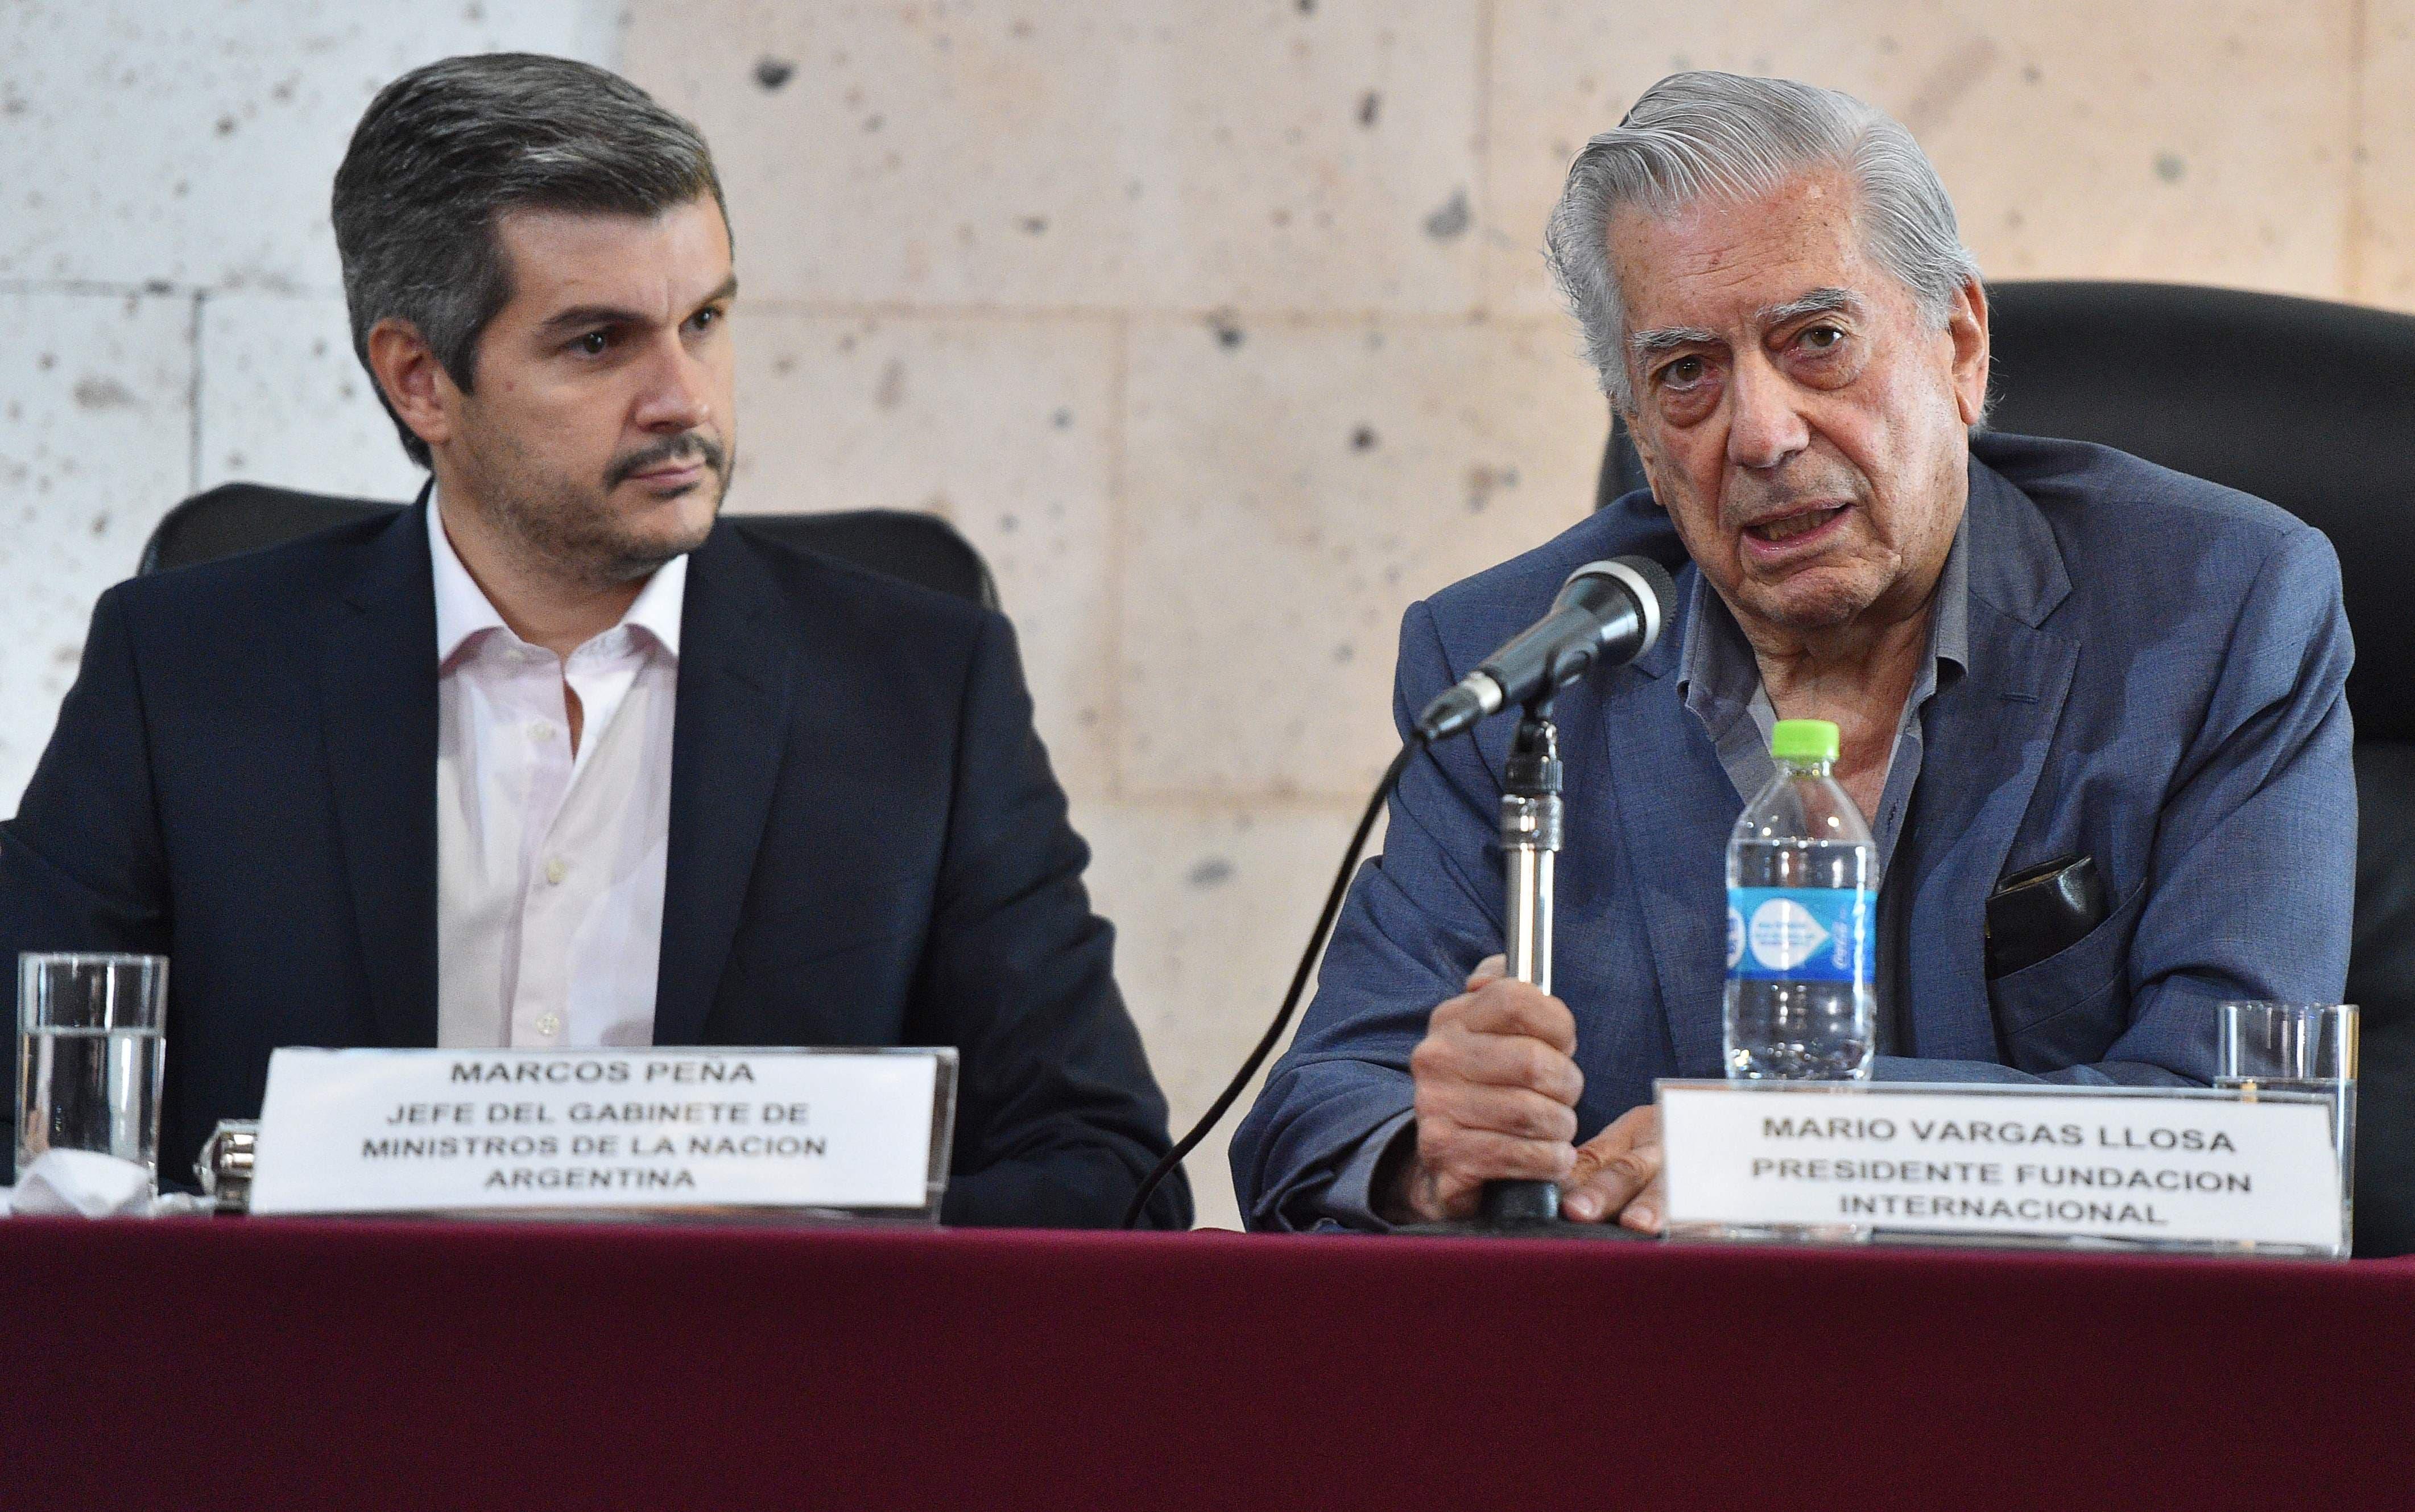 Mario Vargas Llosa pide que expresidentes peruanos aclararen vínculos con Odebrecht